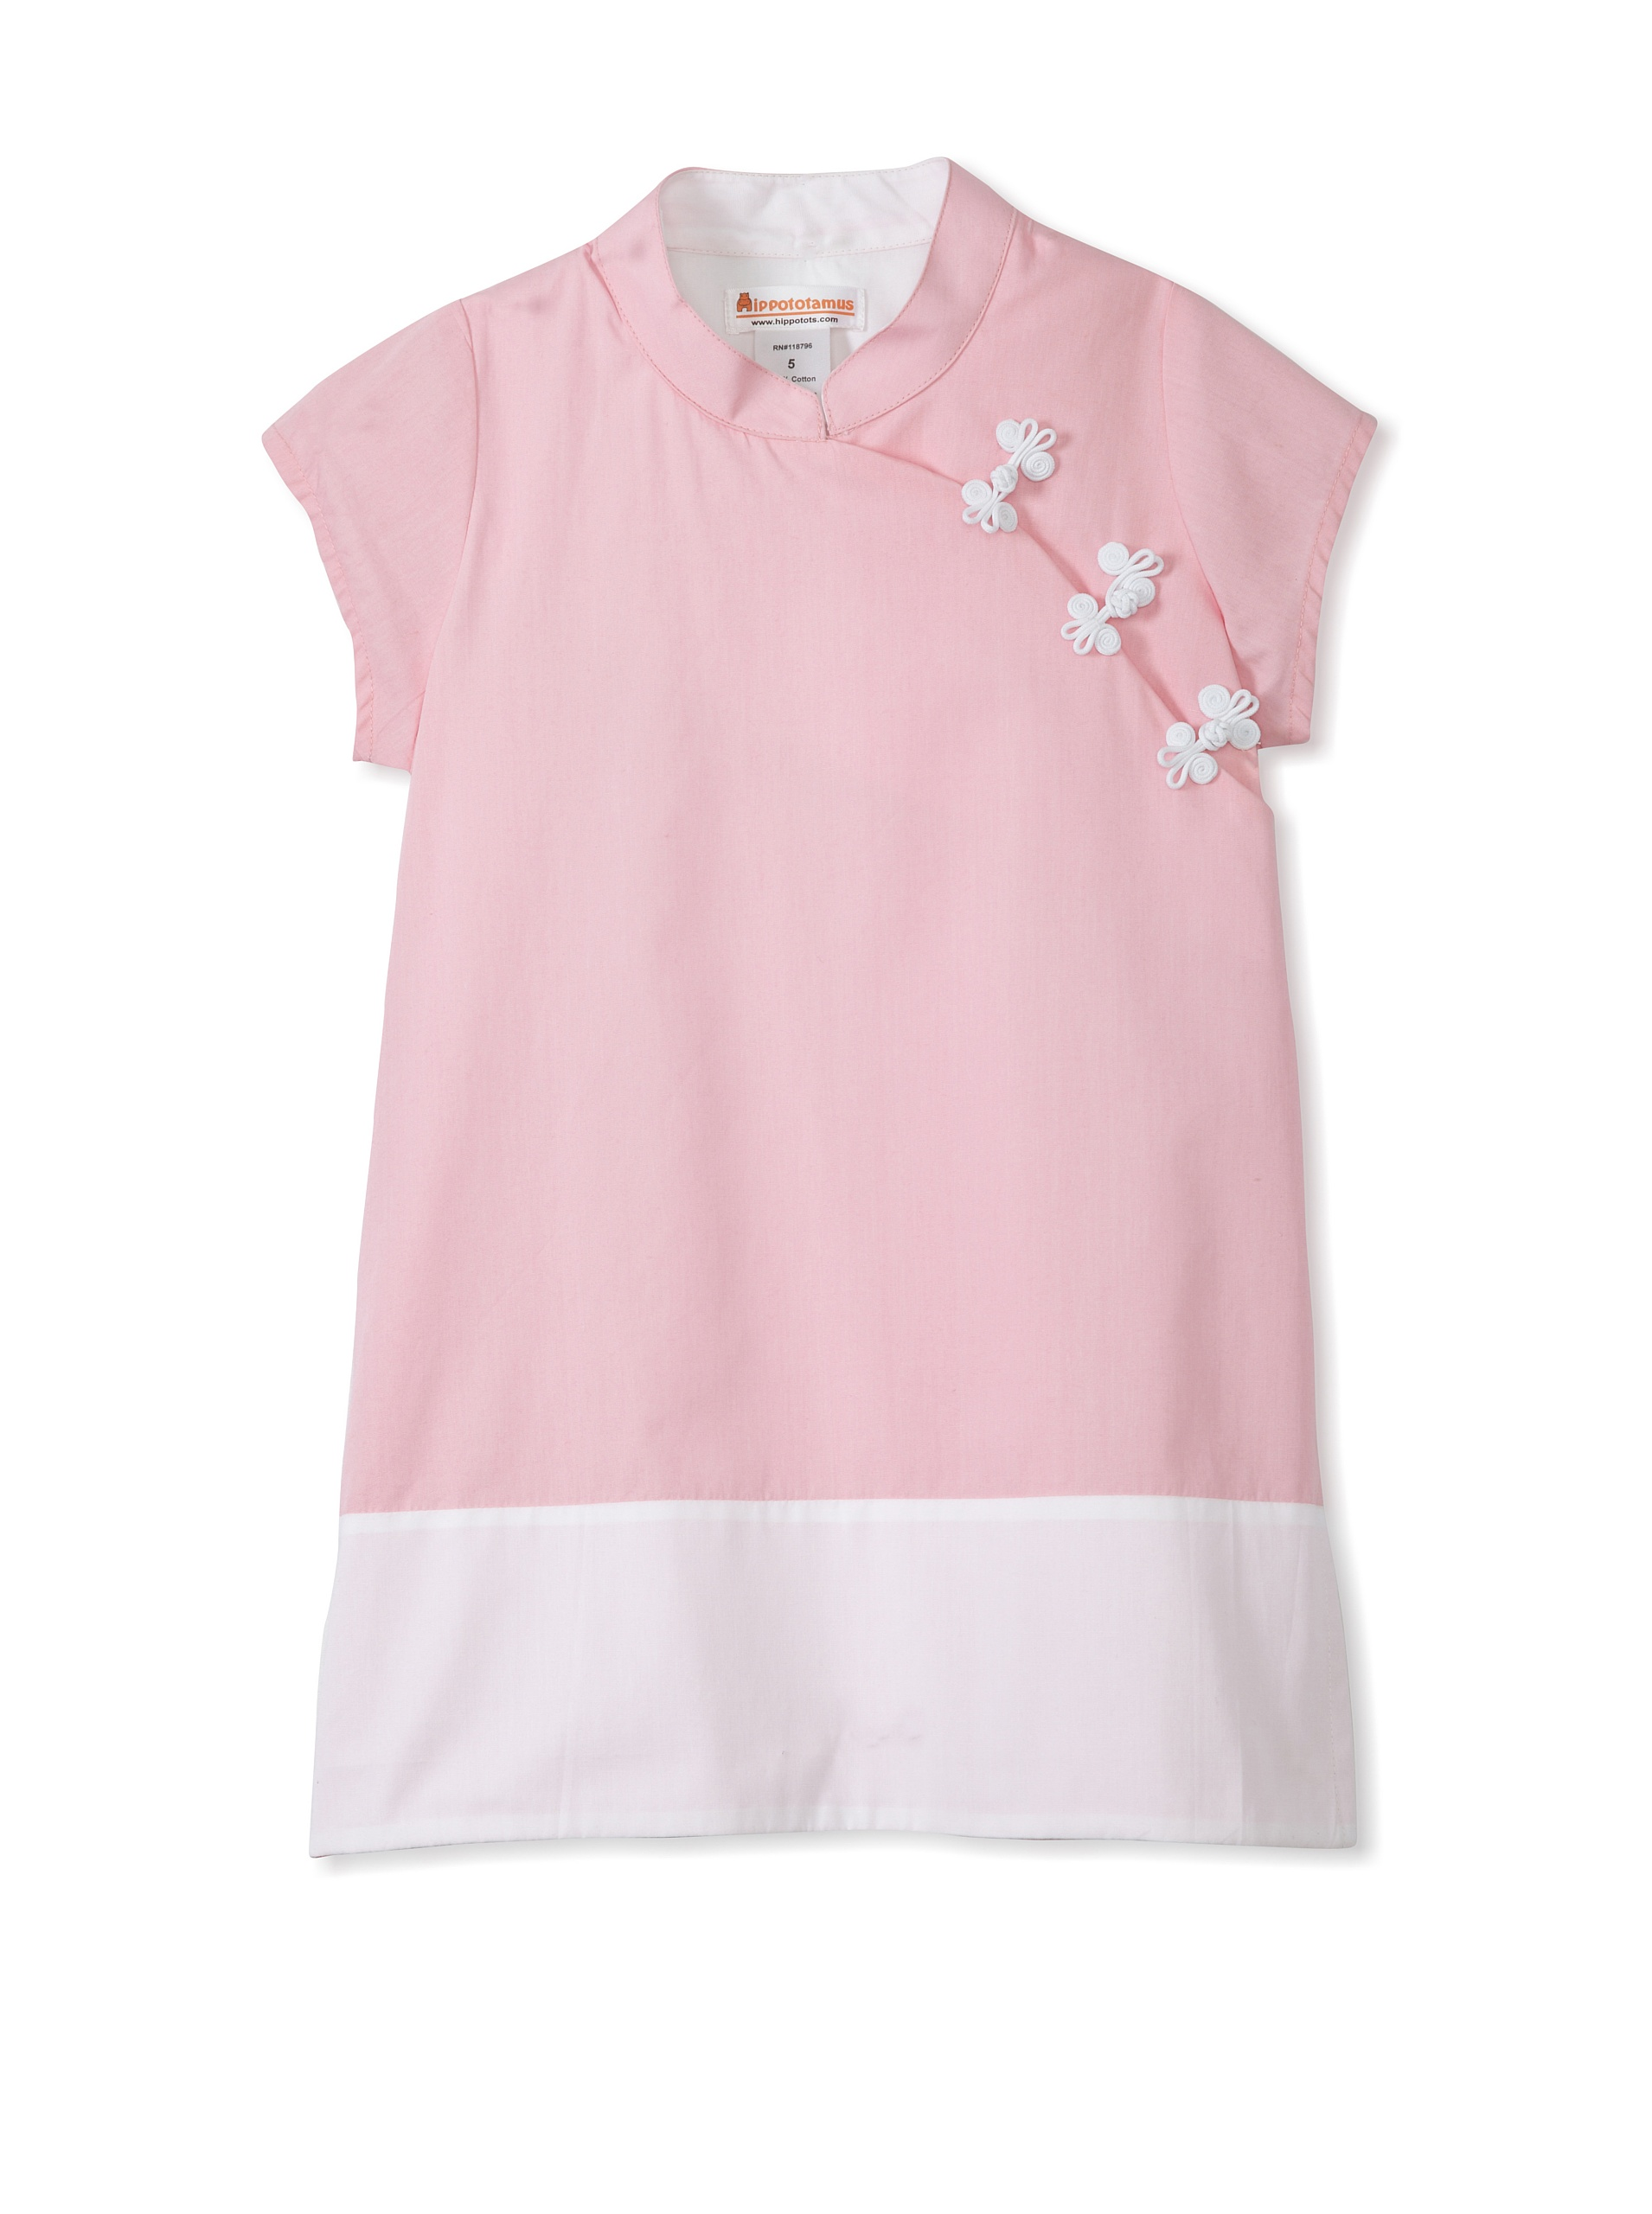 Hippototamus Mandarin Dress (Pink)